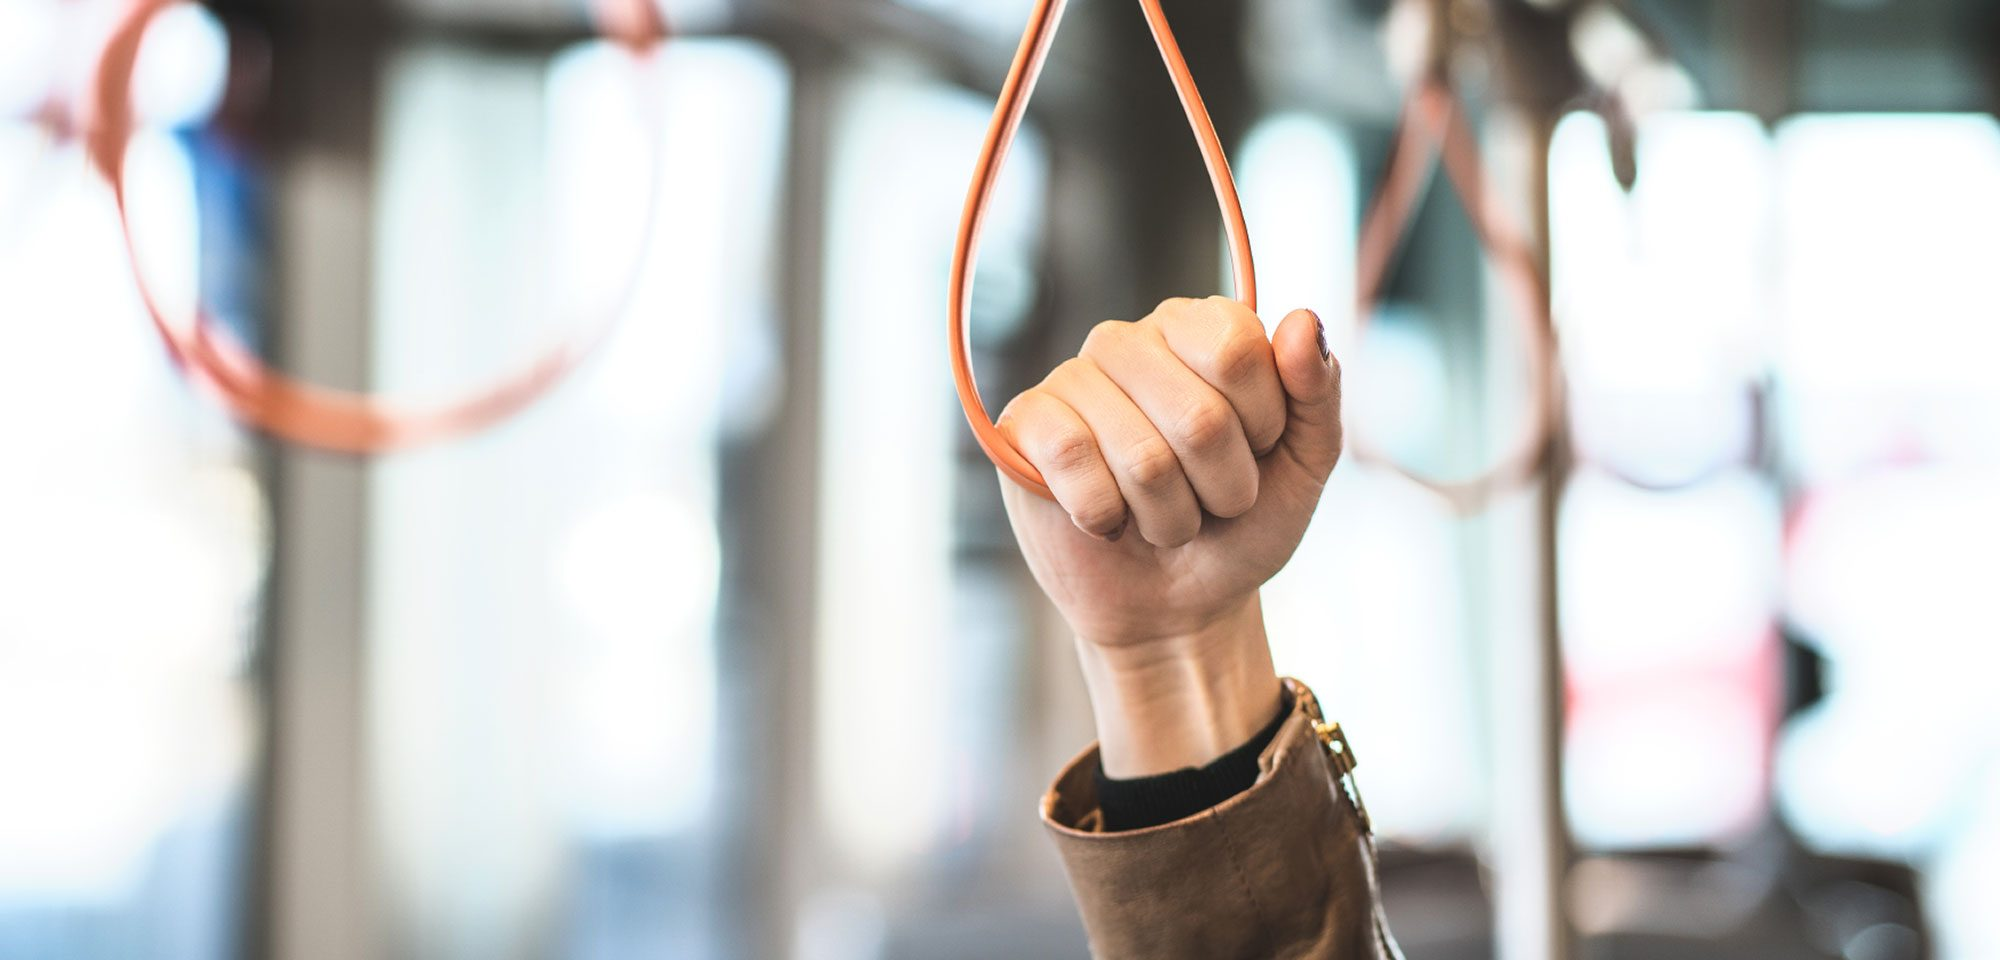 Hand holding strap